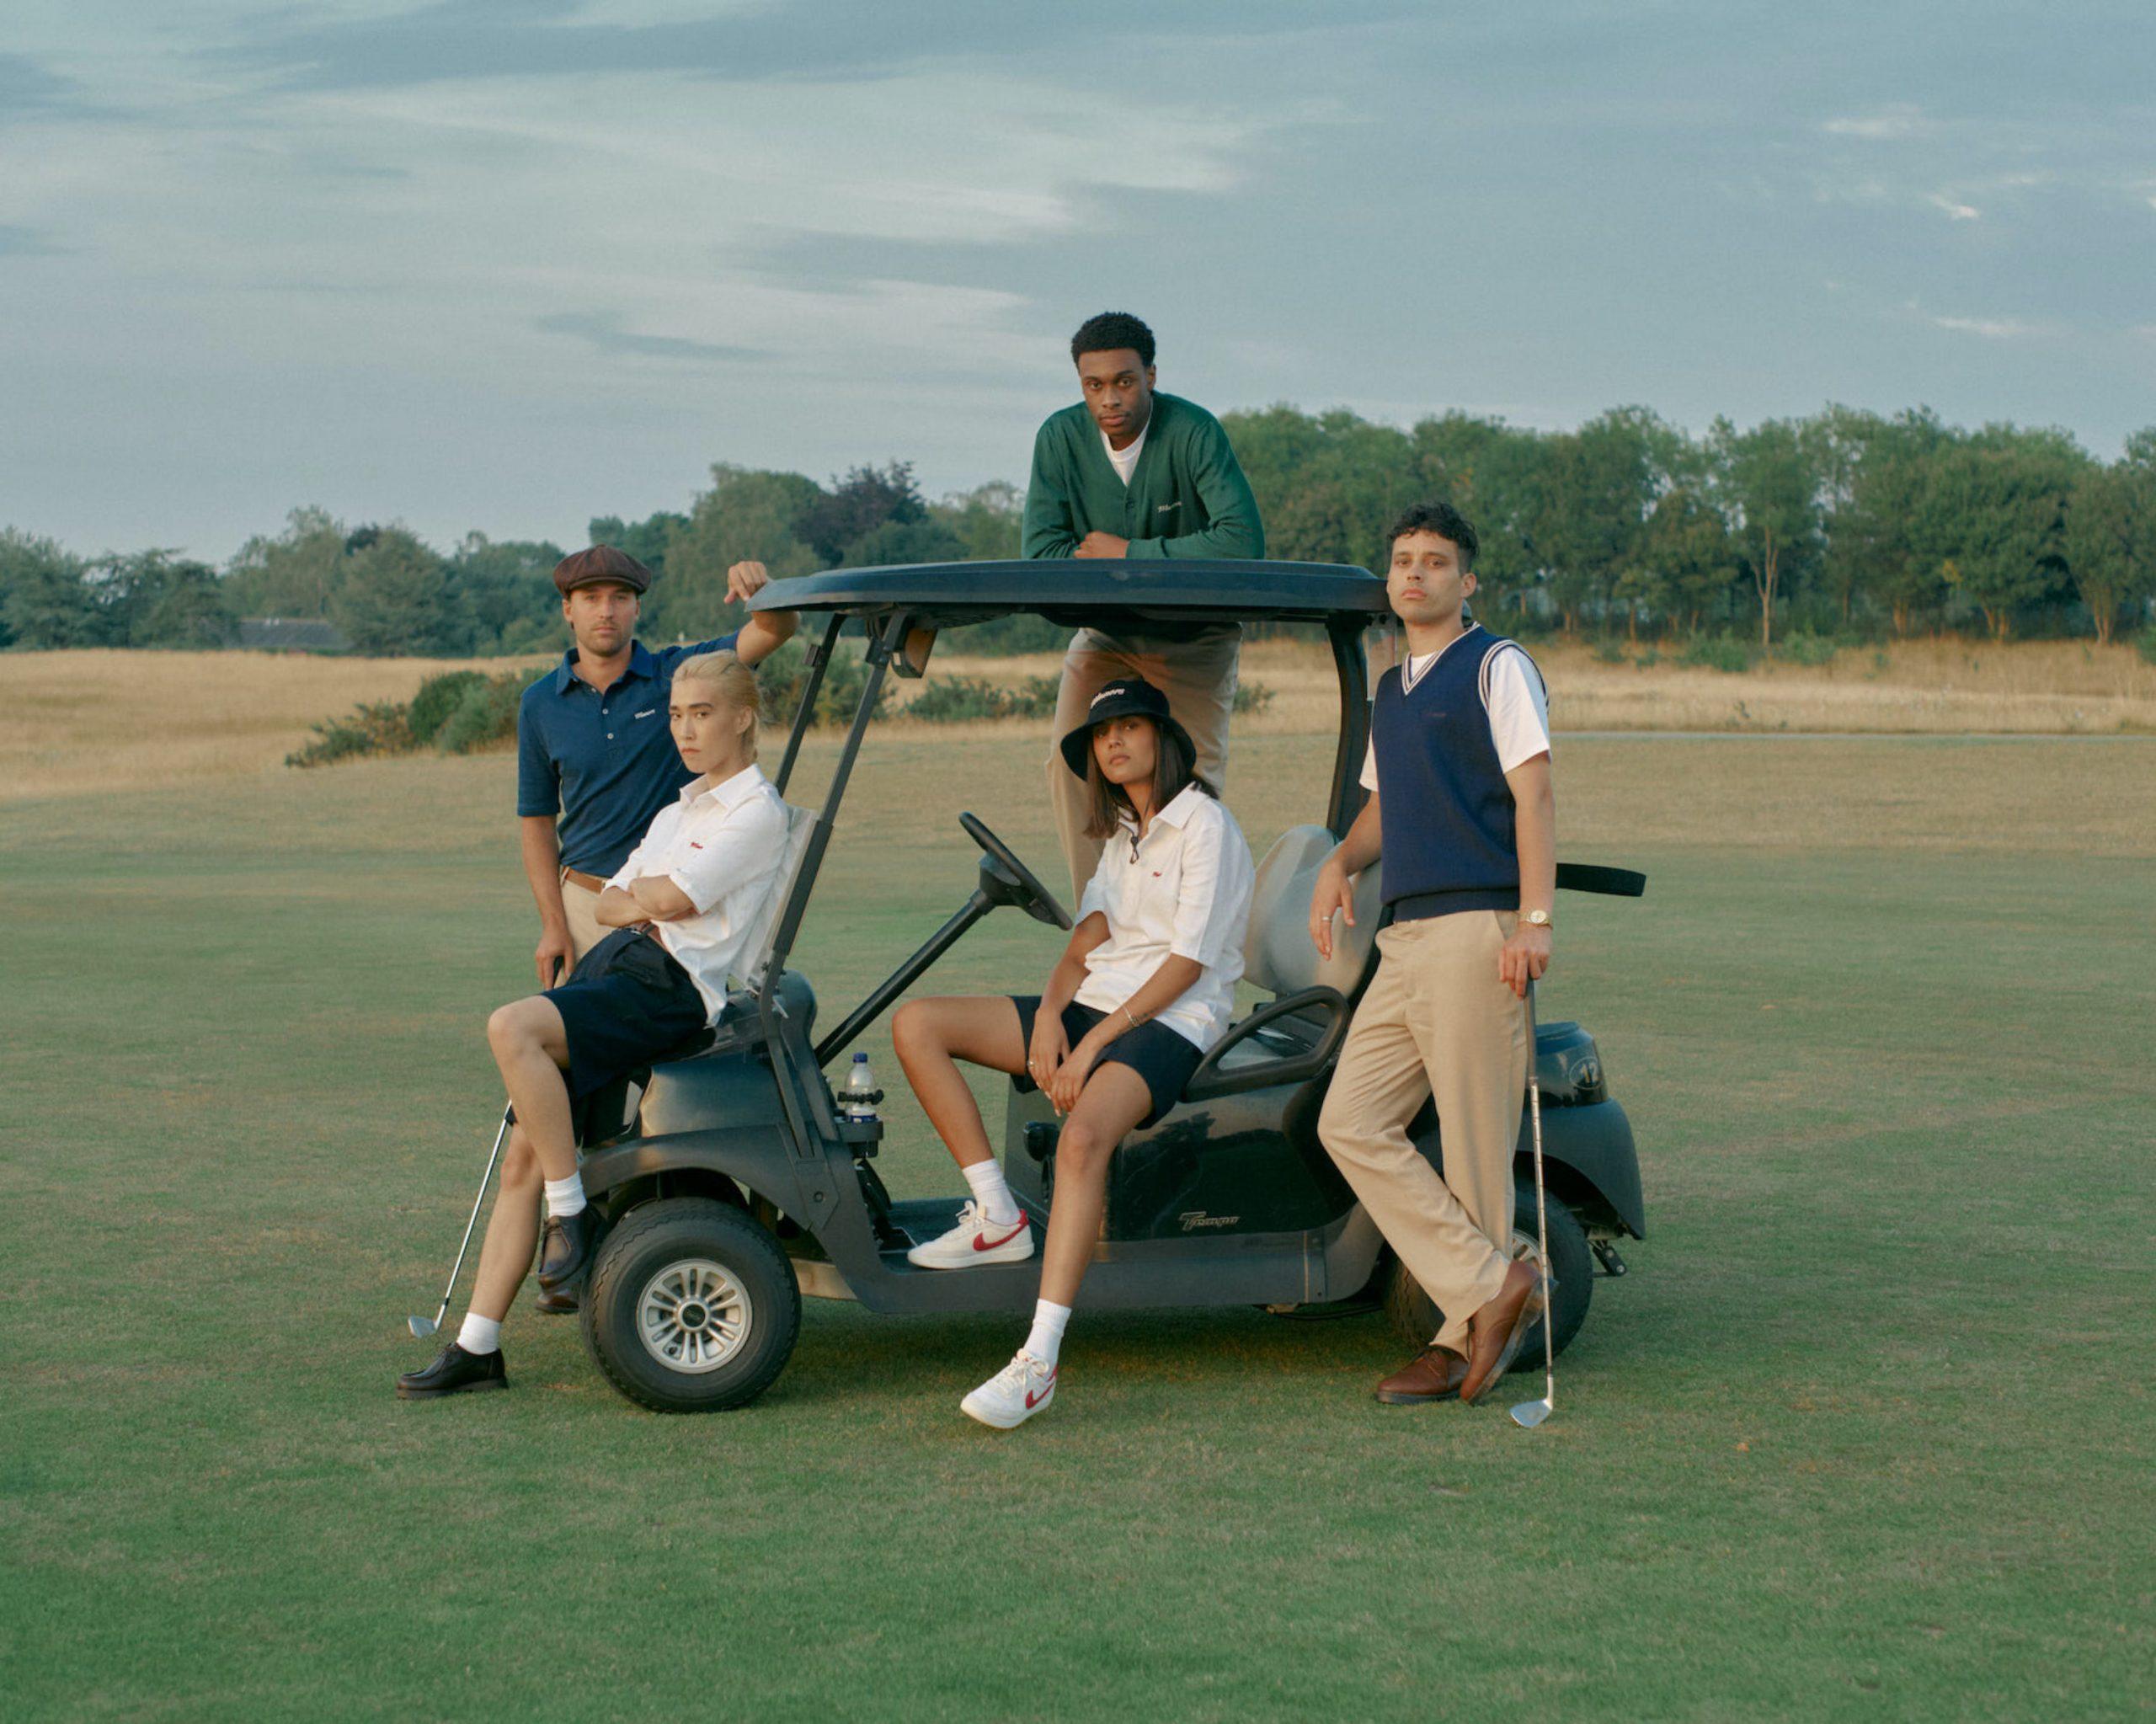 Manors Golf  | The Wonderful World of Golf Video Production Birmingham